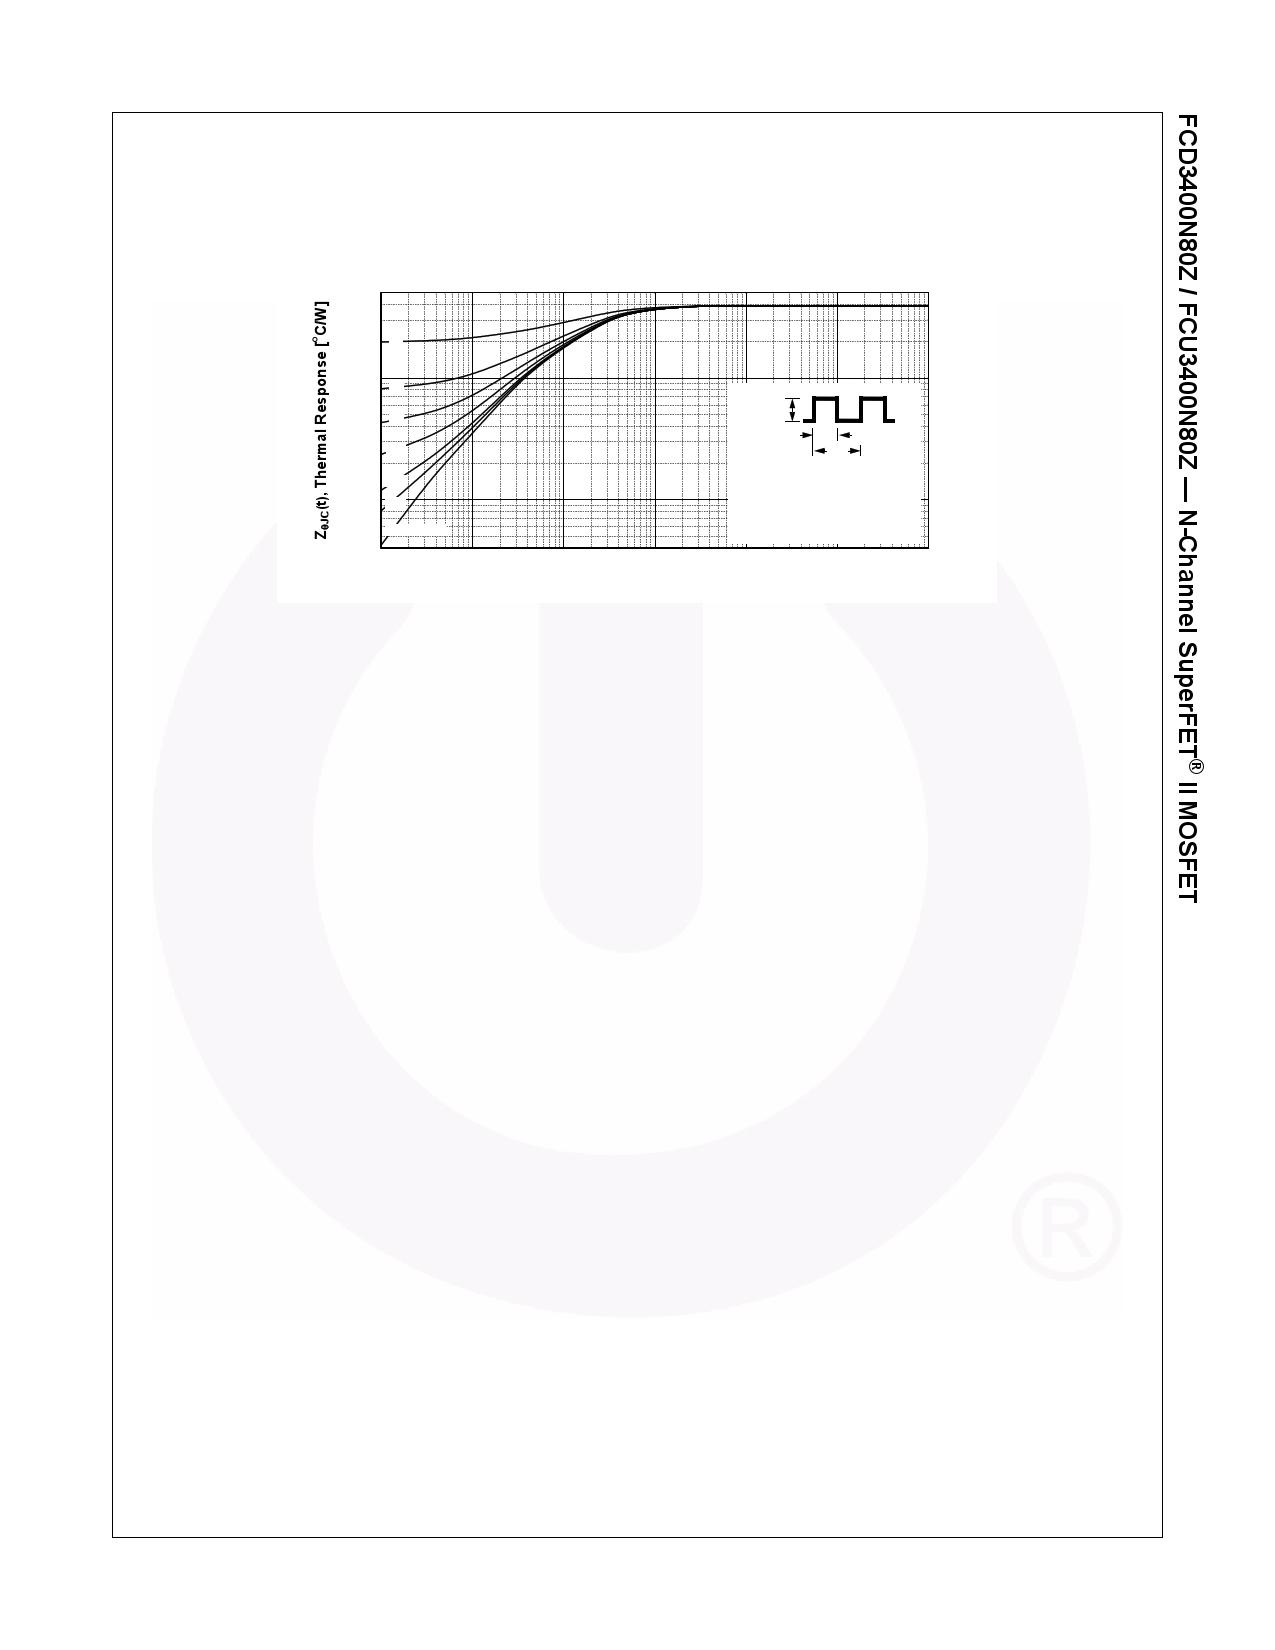 FCU3400N80Z pdf, arduino